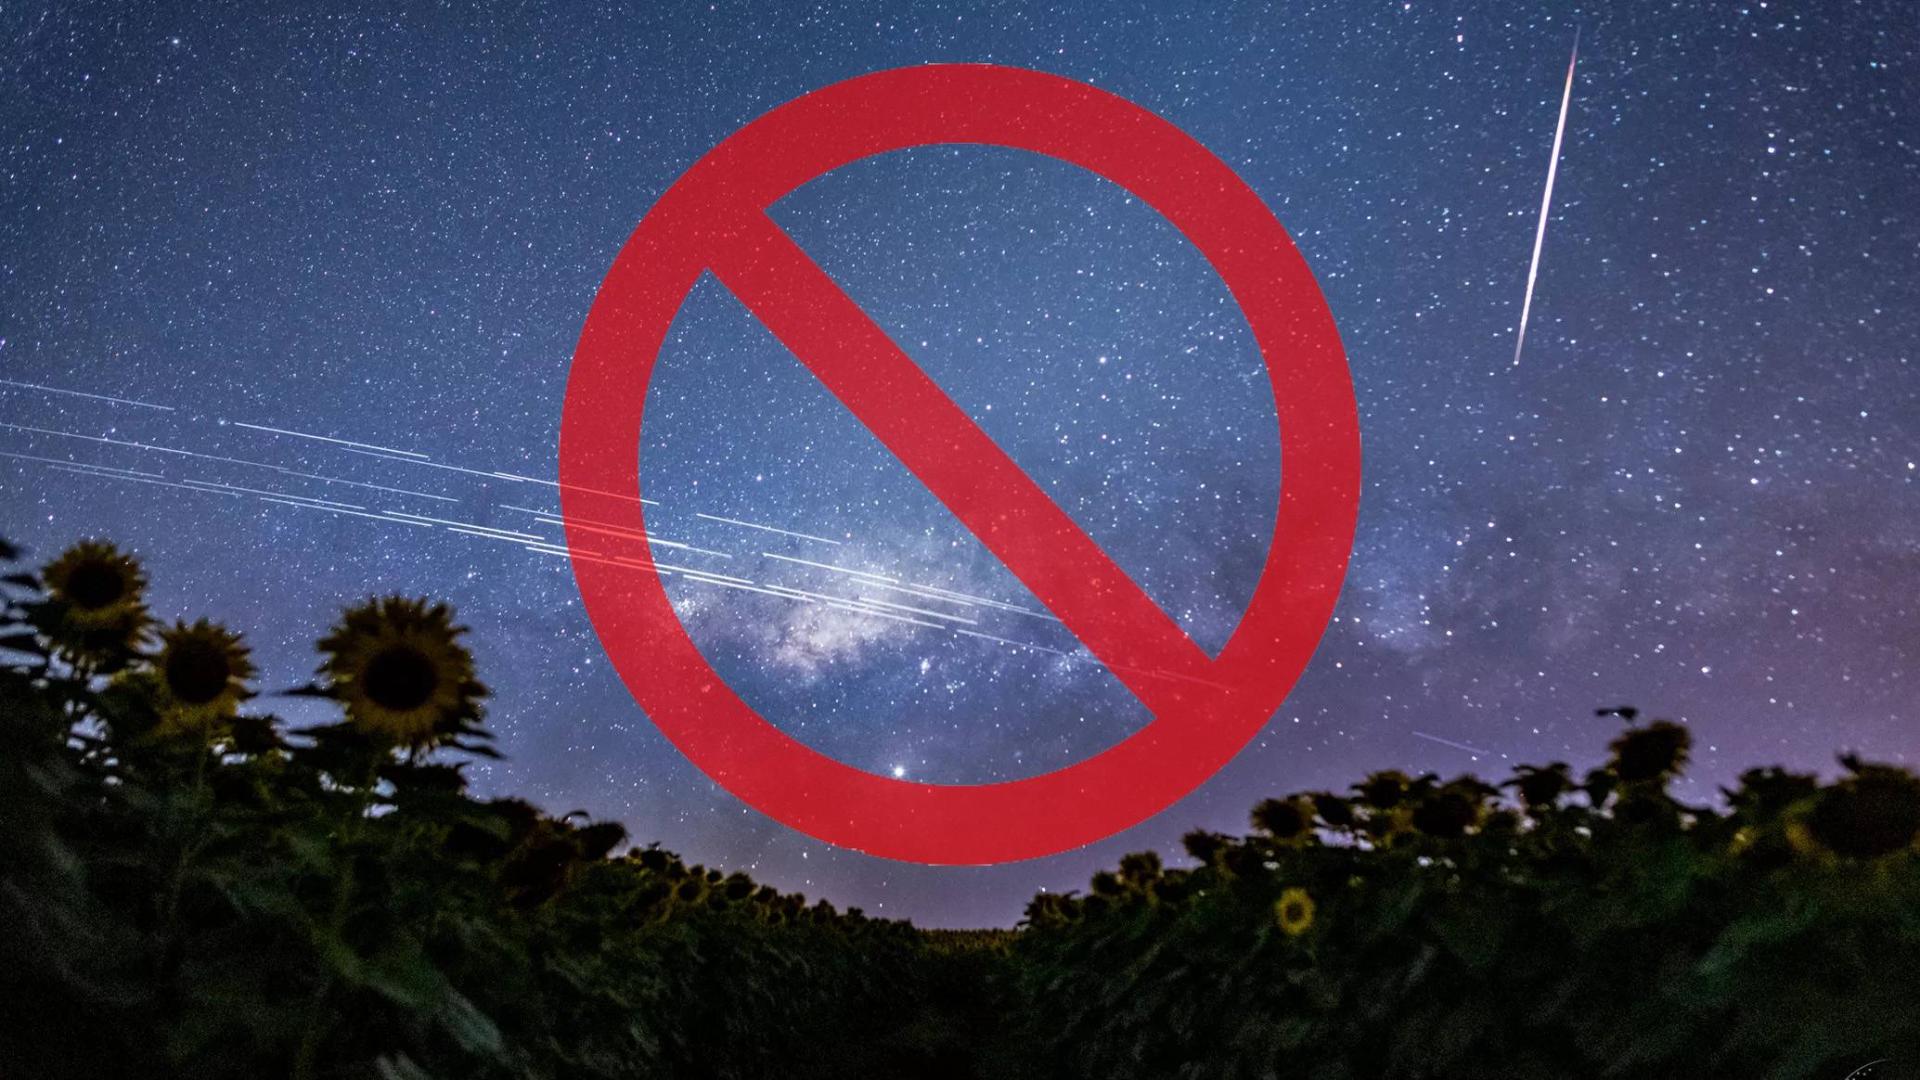 SpaceX第四批星链卫星上天,天文学家呼吁:请还我们那片干净的夜空!